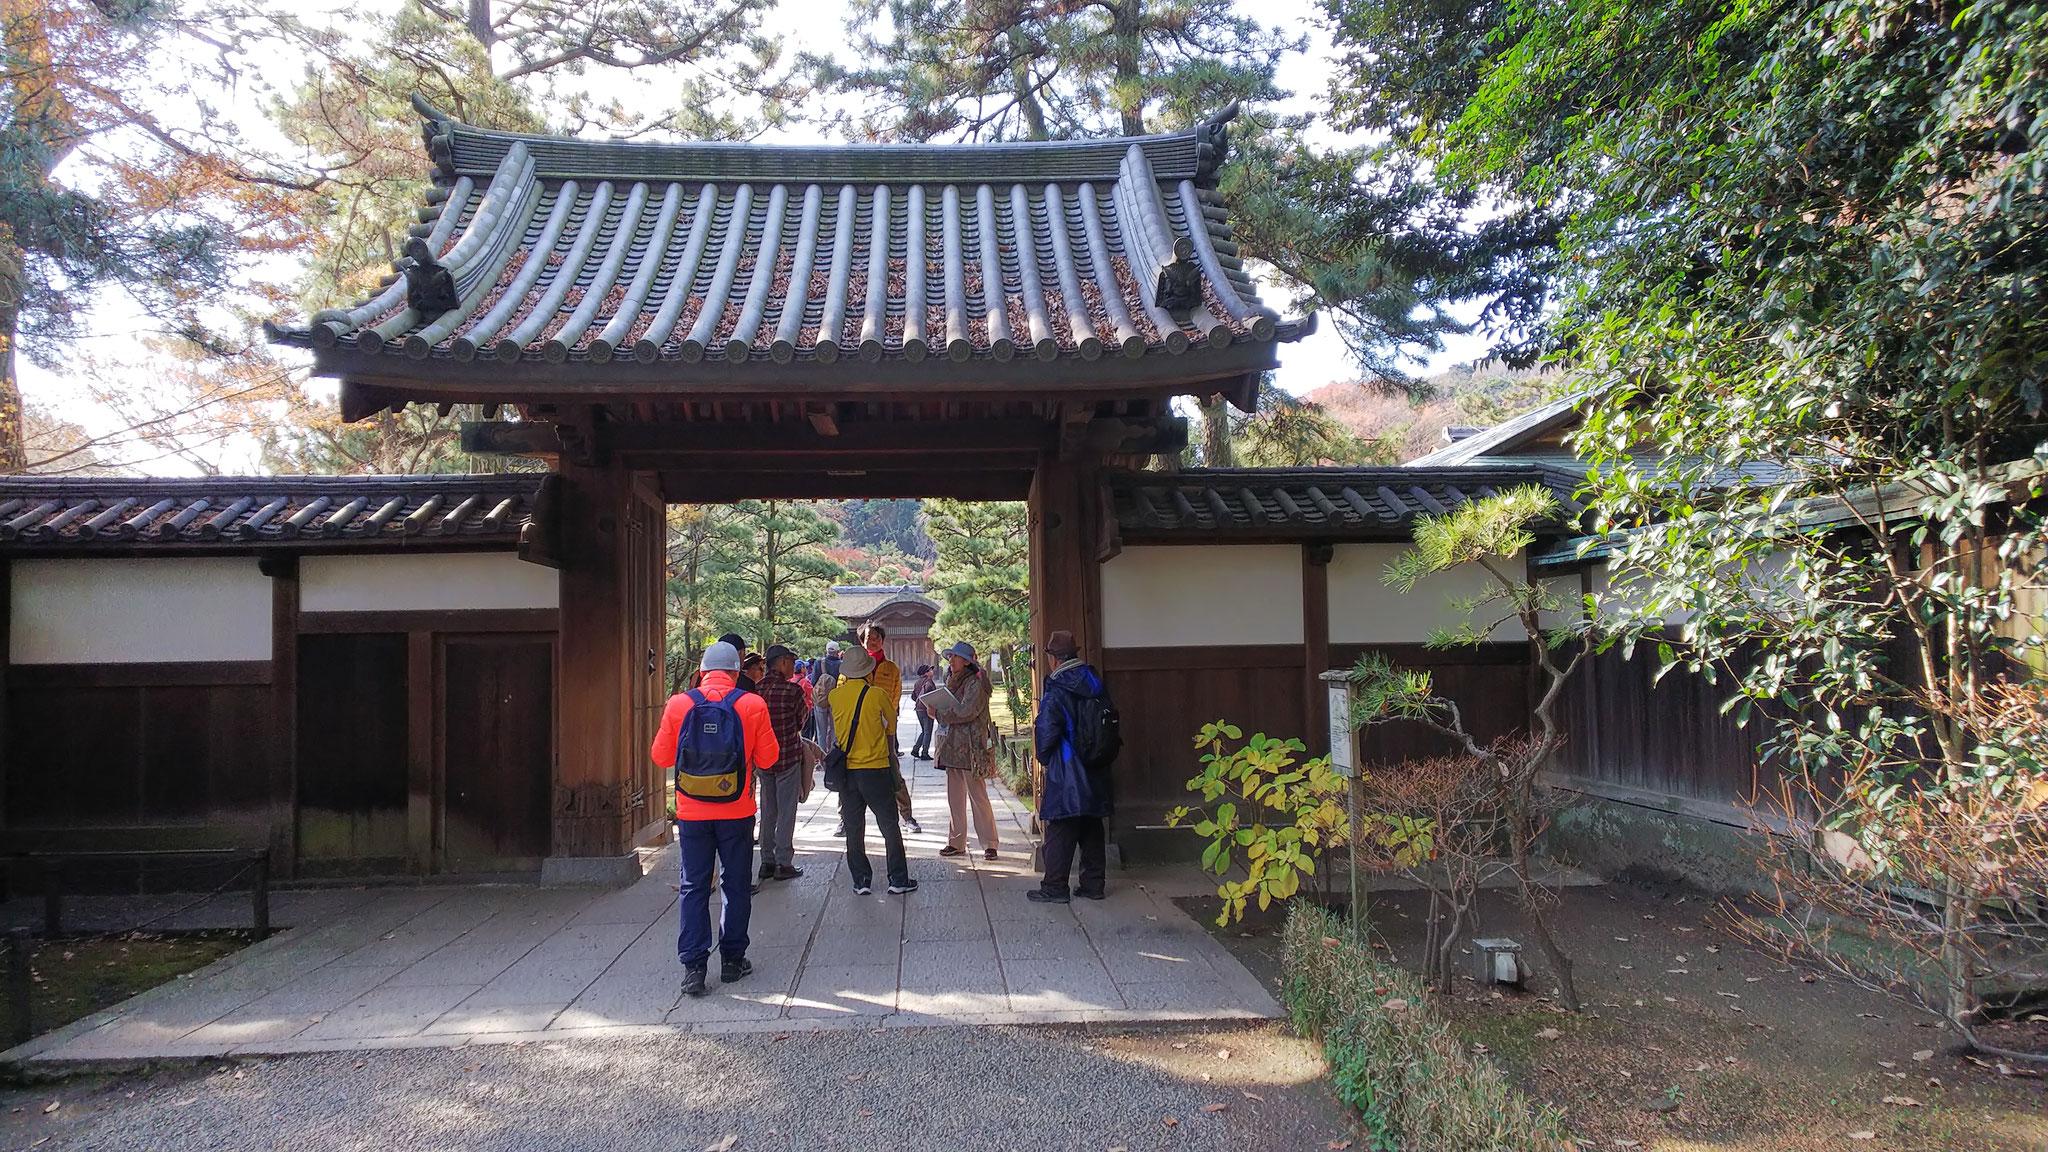 内苑入り口の「御門」 京都東山の西方寺にあった薬医門